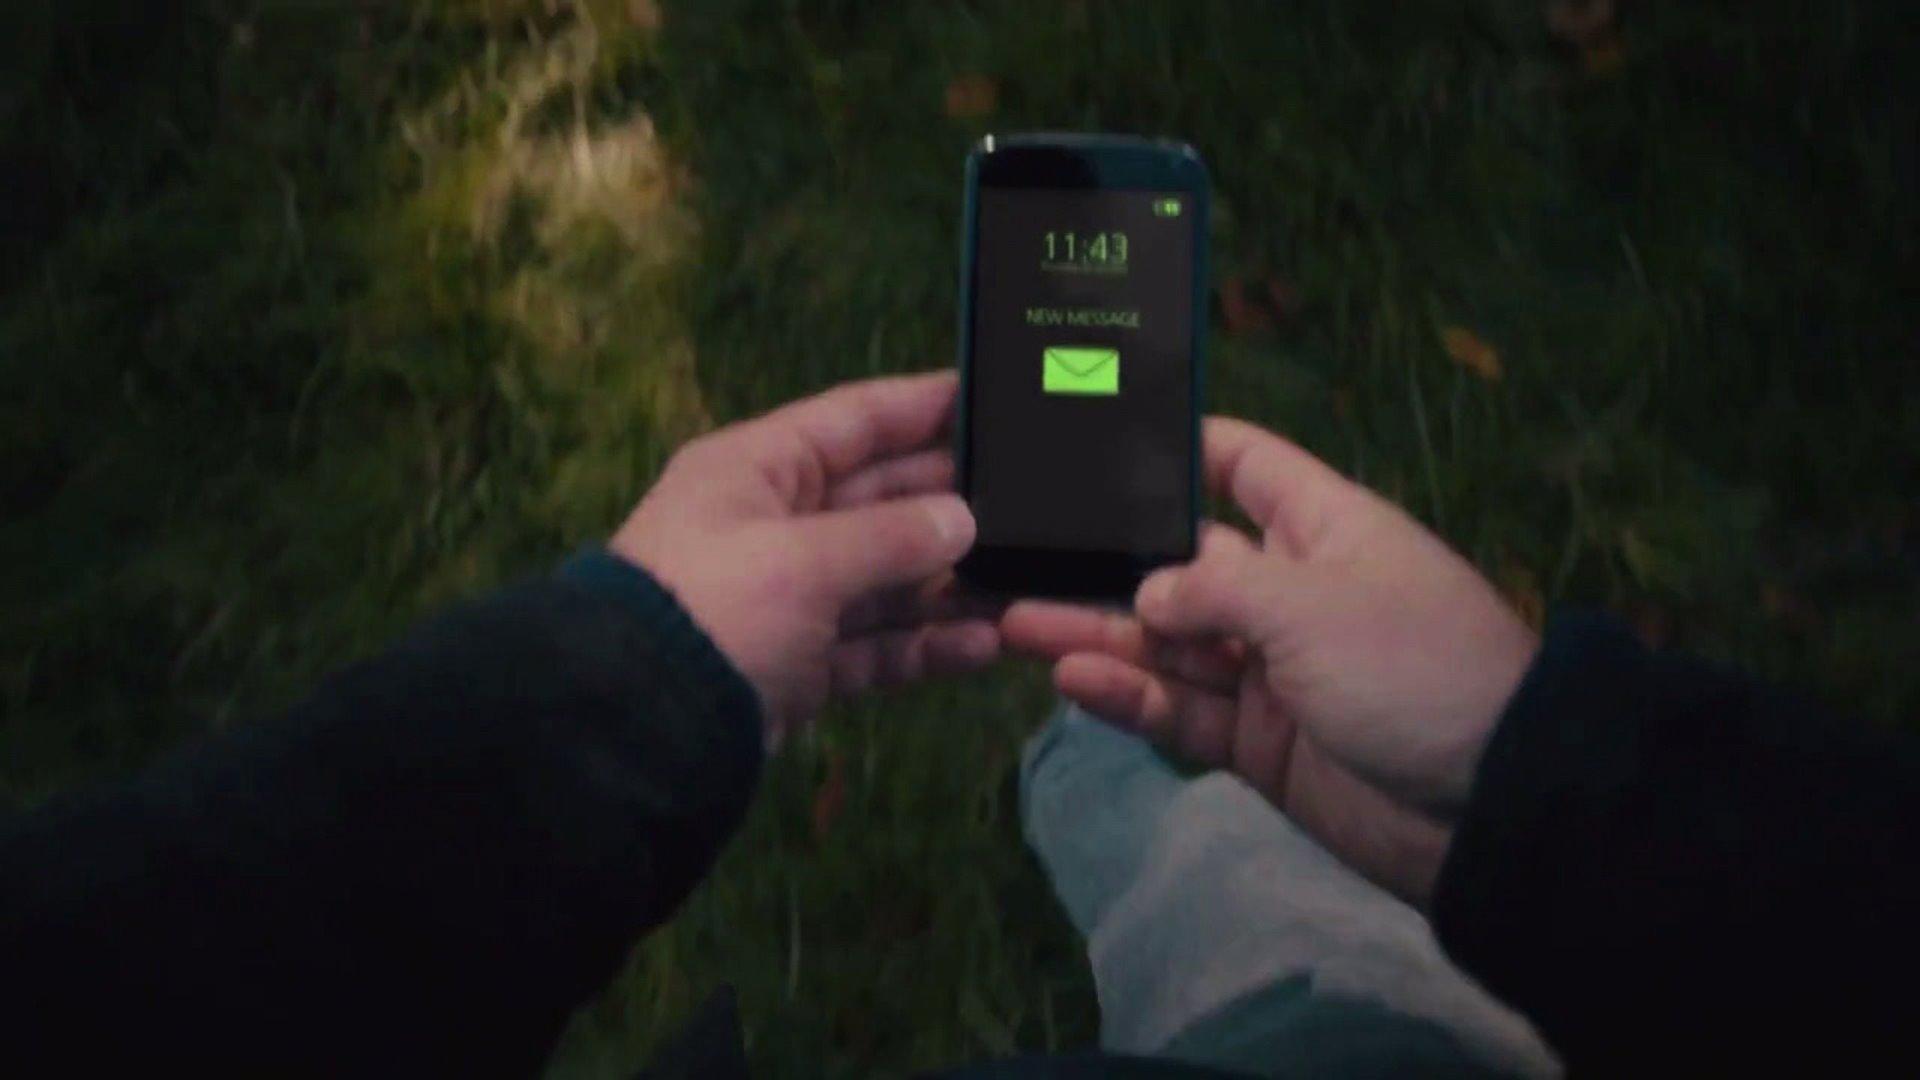 App designed to prevent suicide